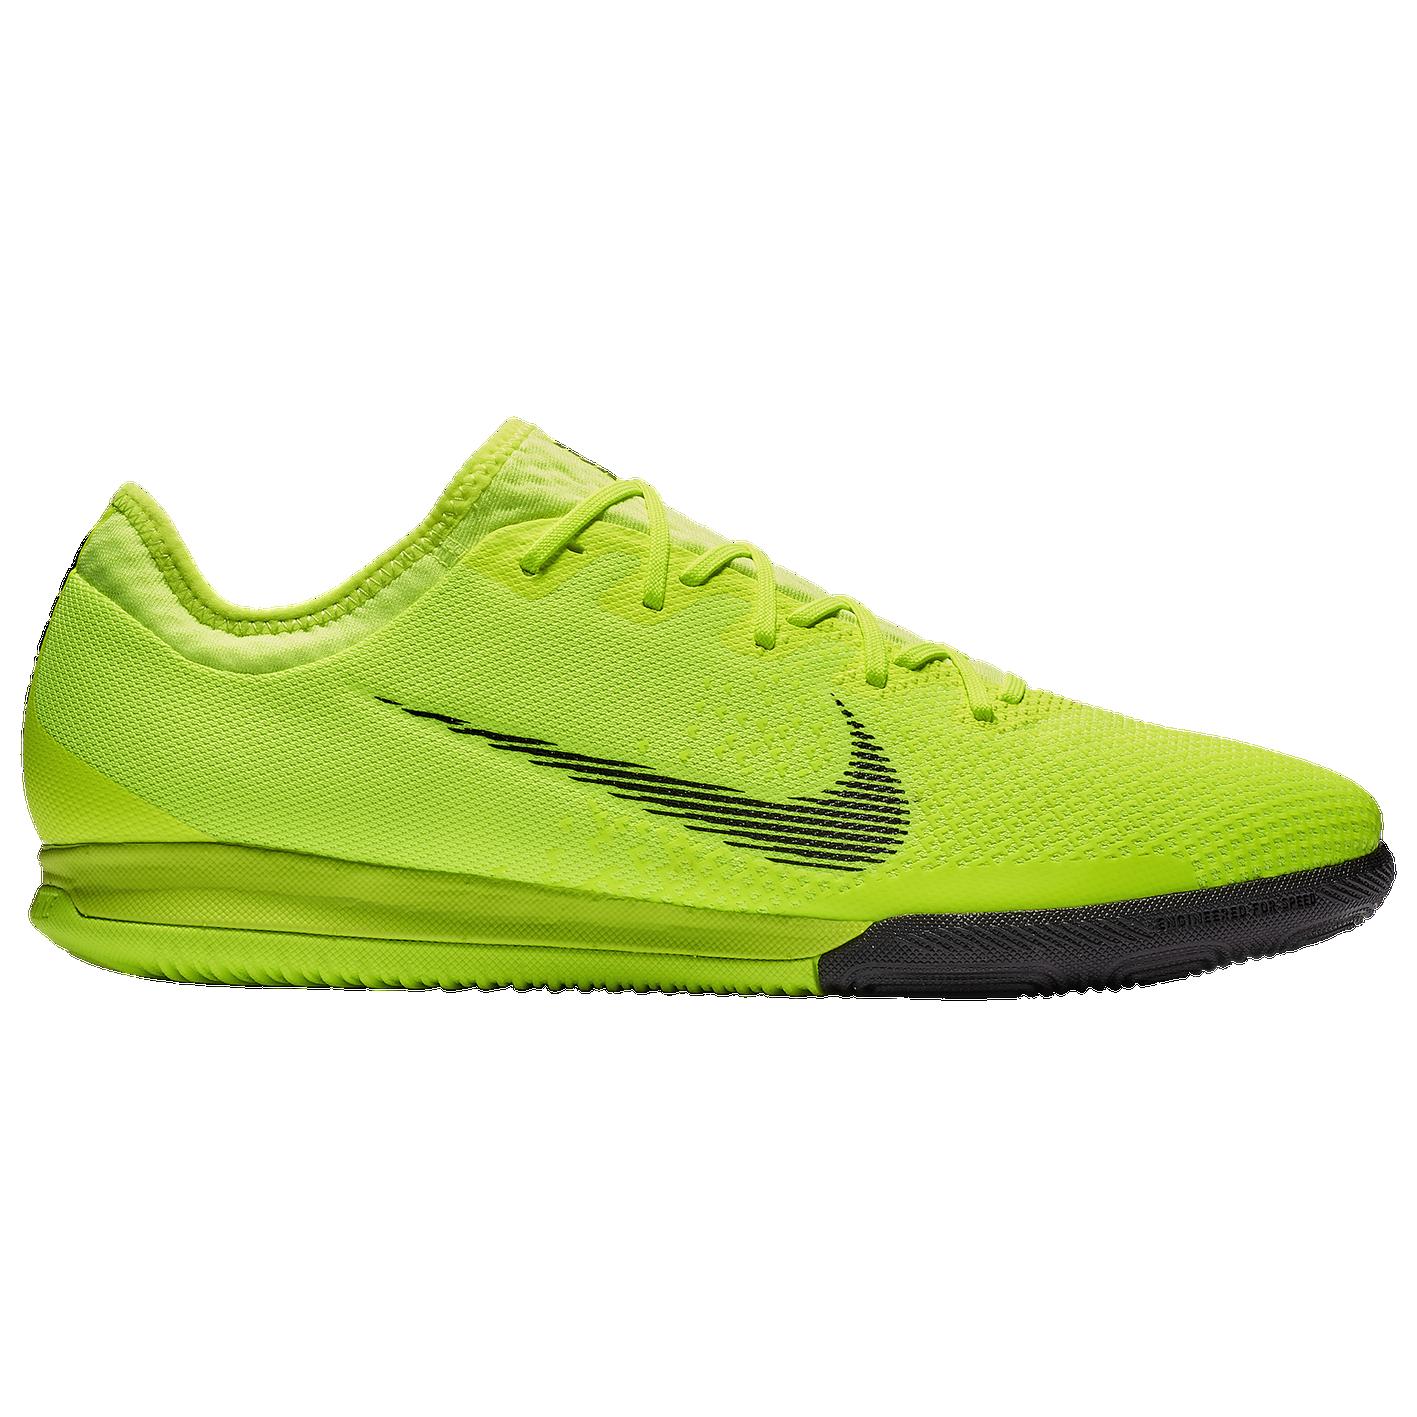 93c1d9e00 Nike Mercurial VaporX 12 Pro IC - Men s - Soccer - Shoes - Volt Black